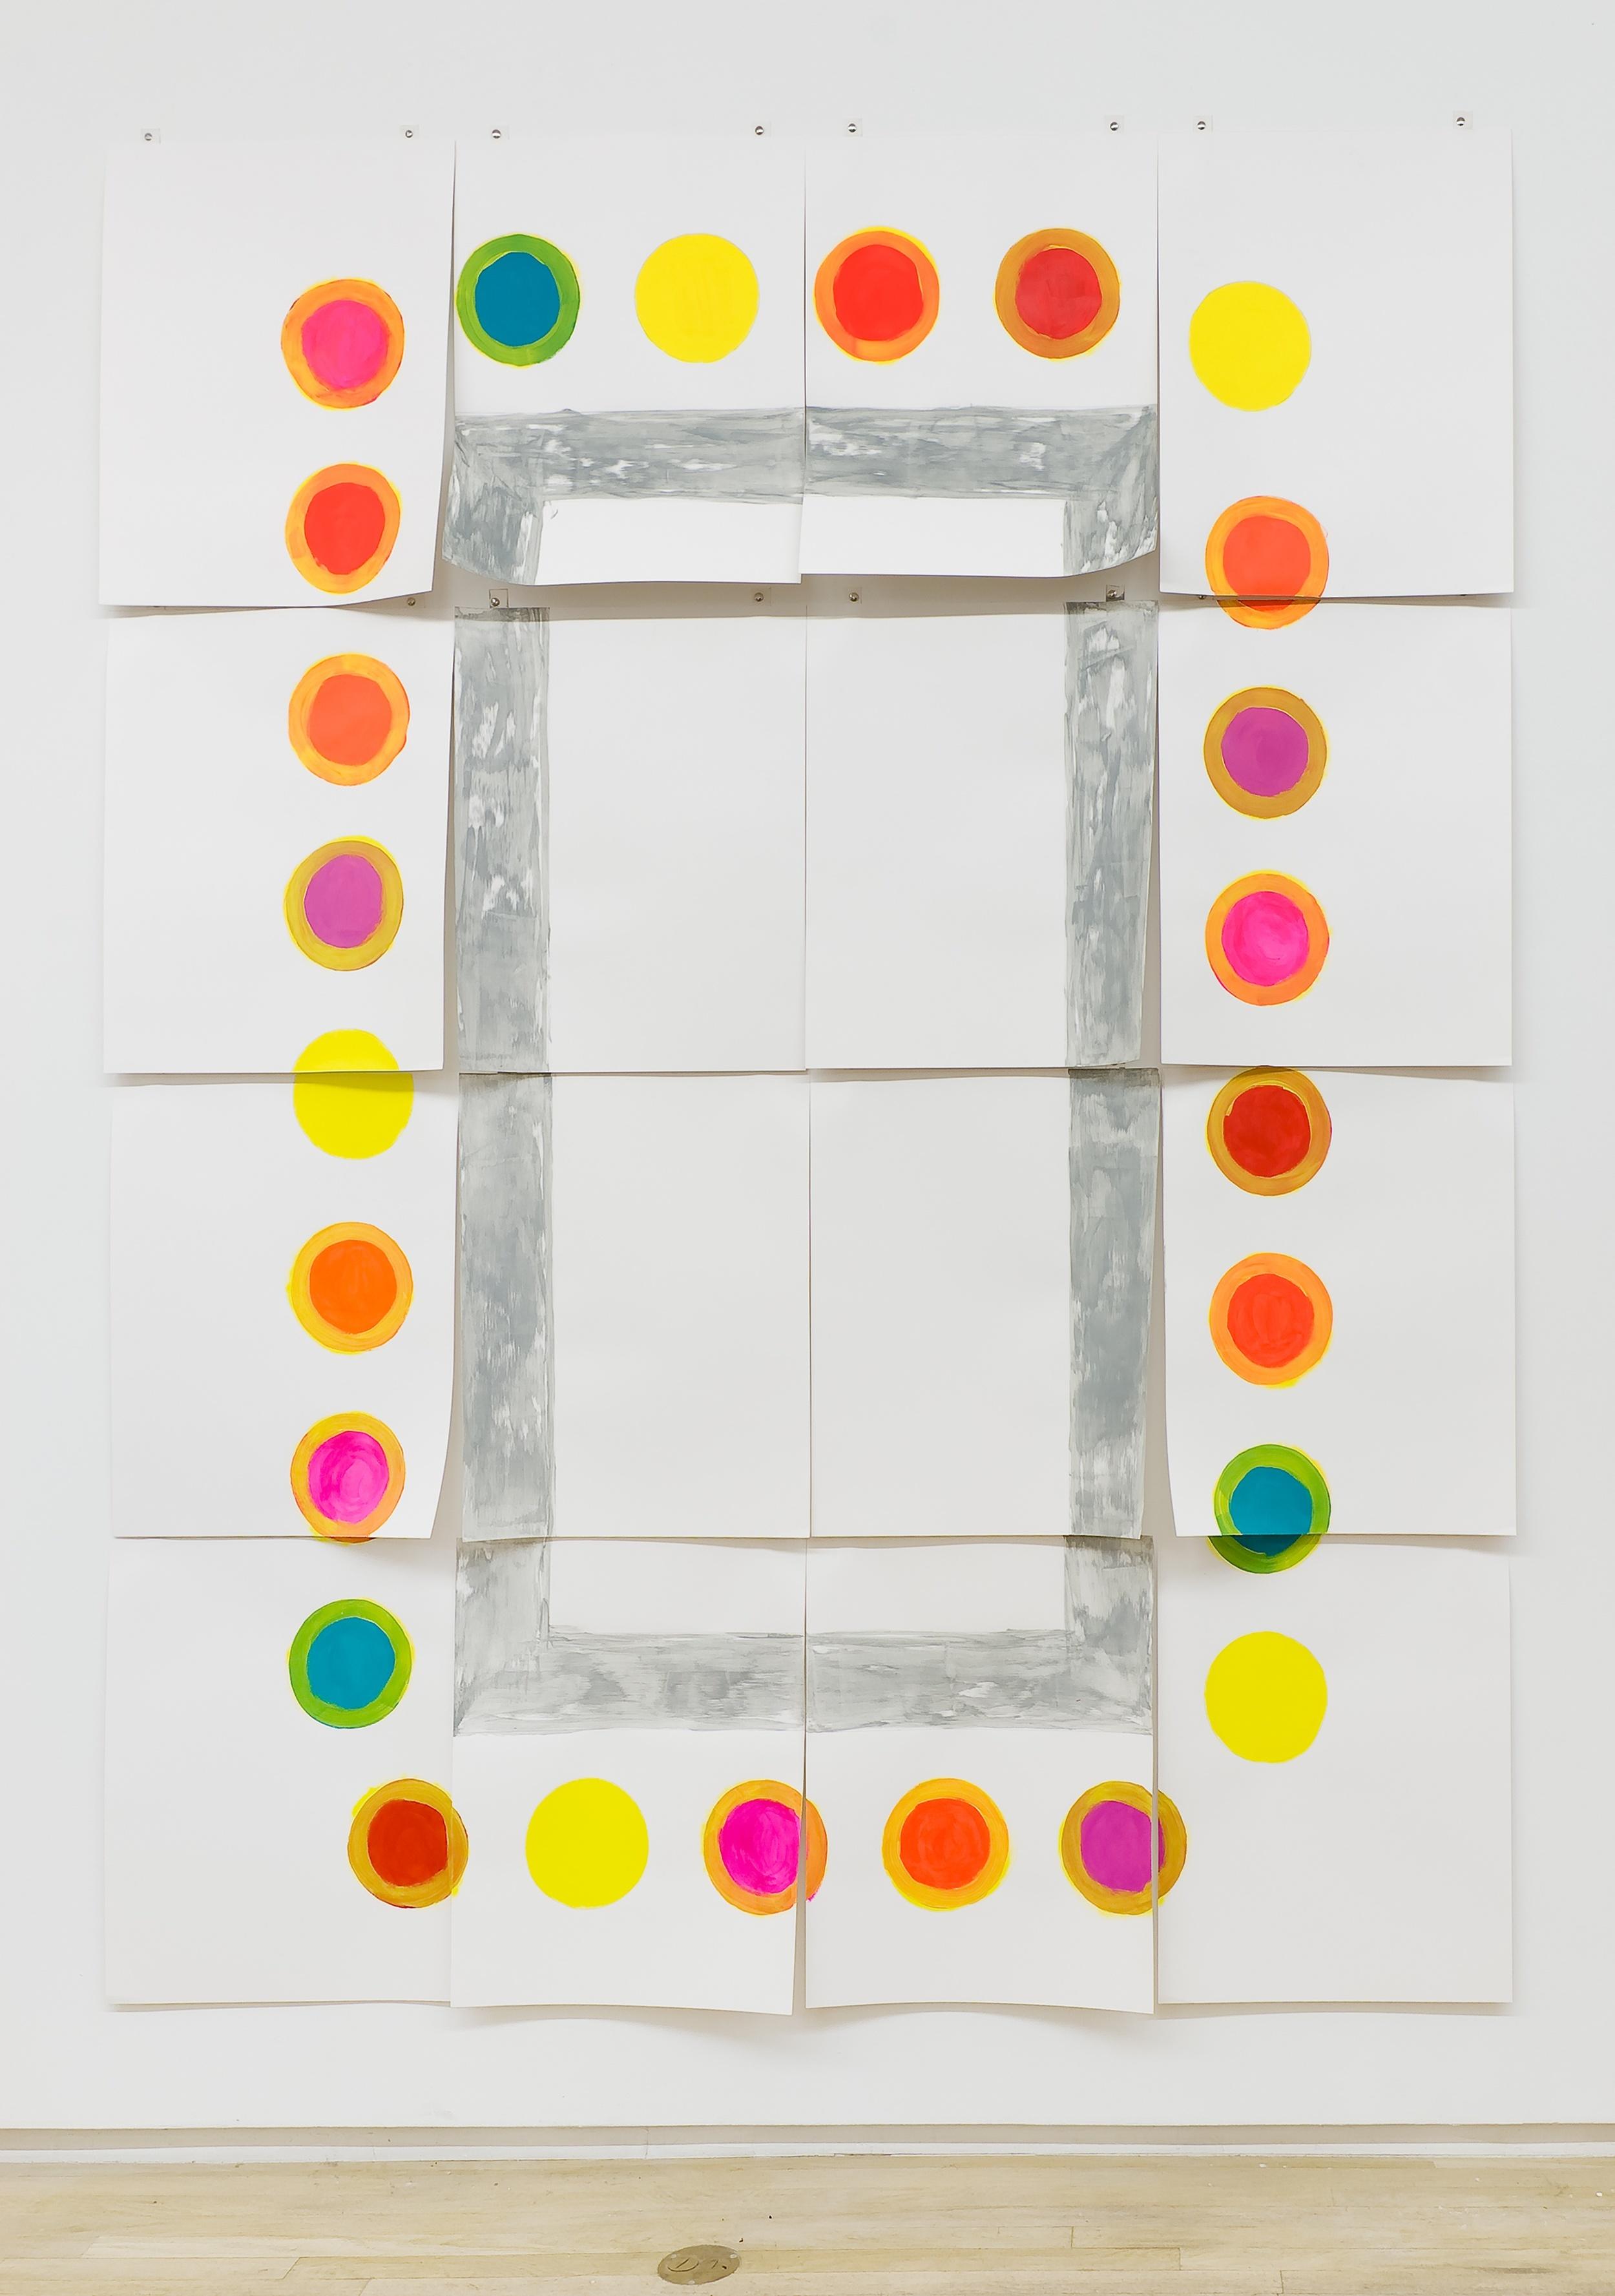 Untitled (Mirror) 2008